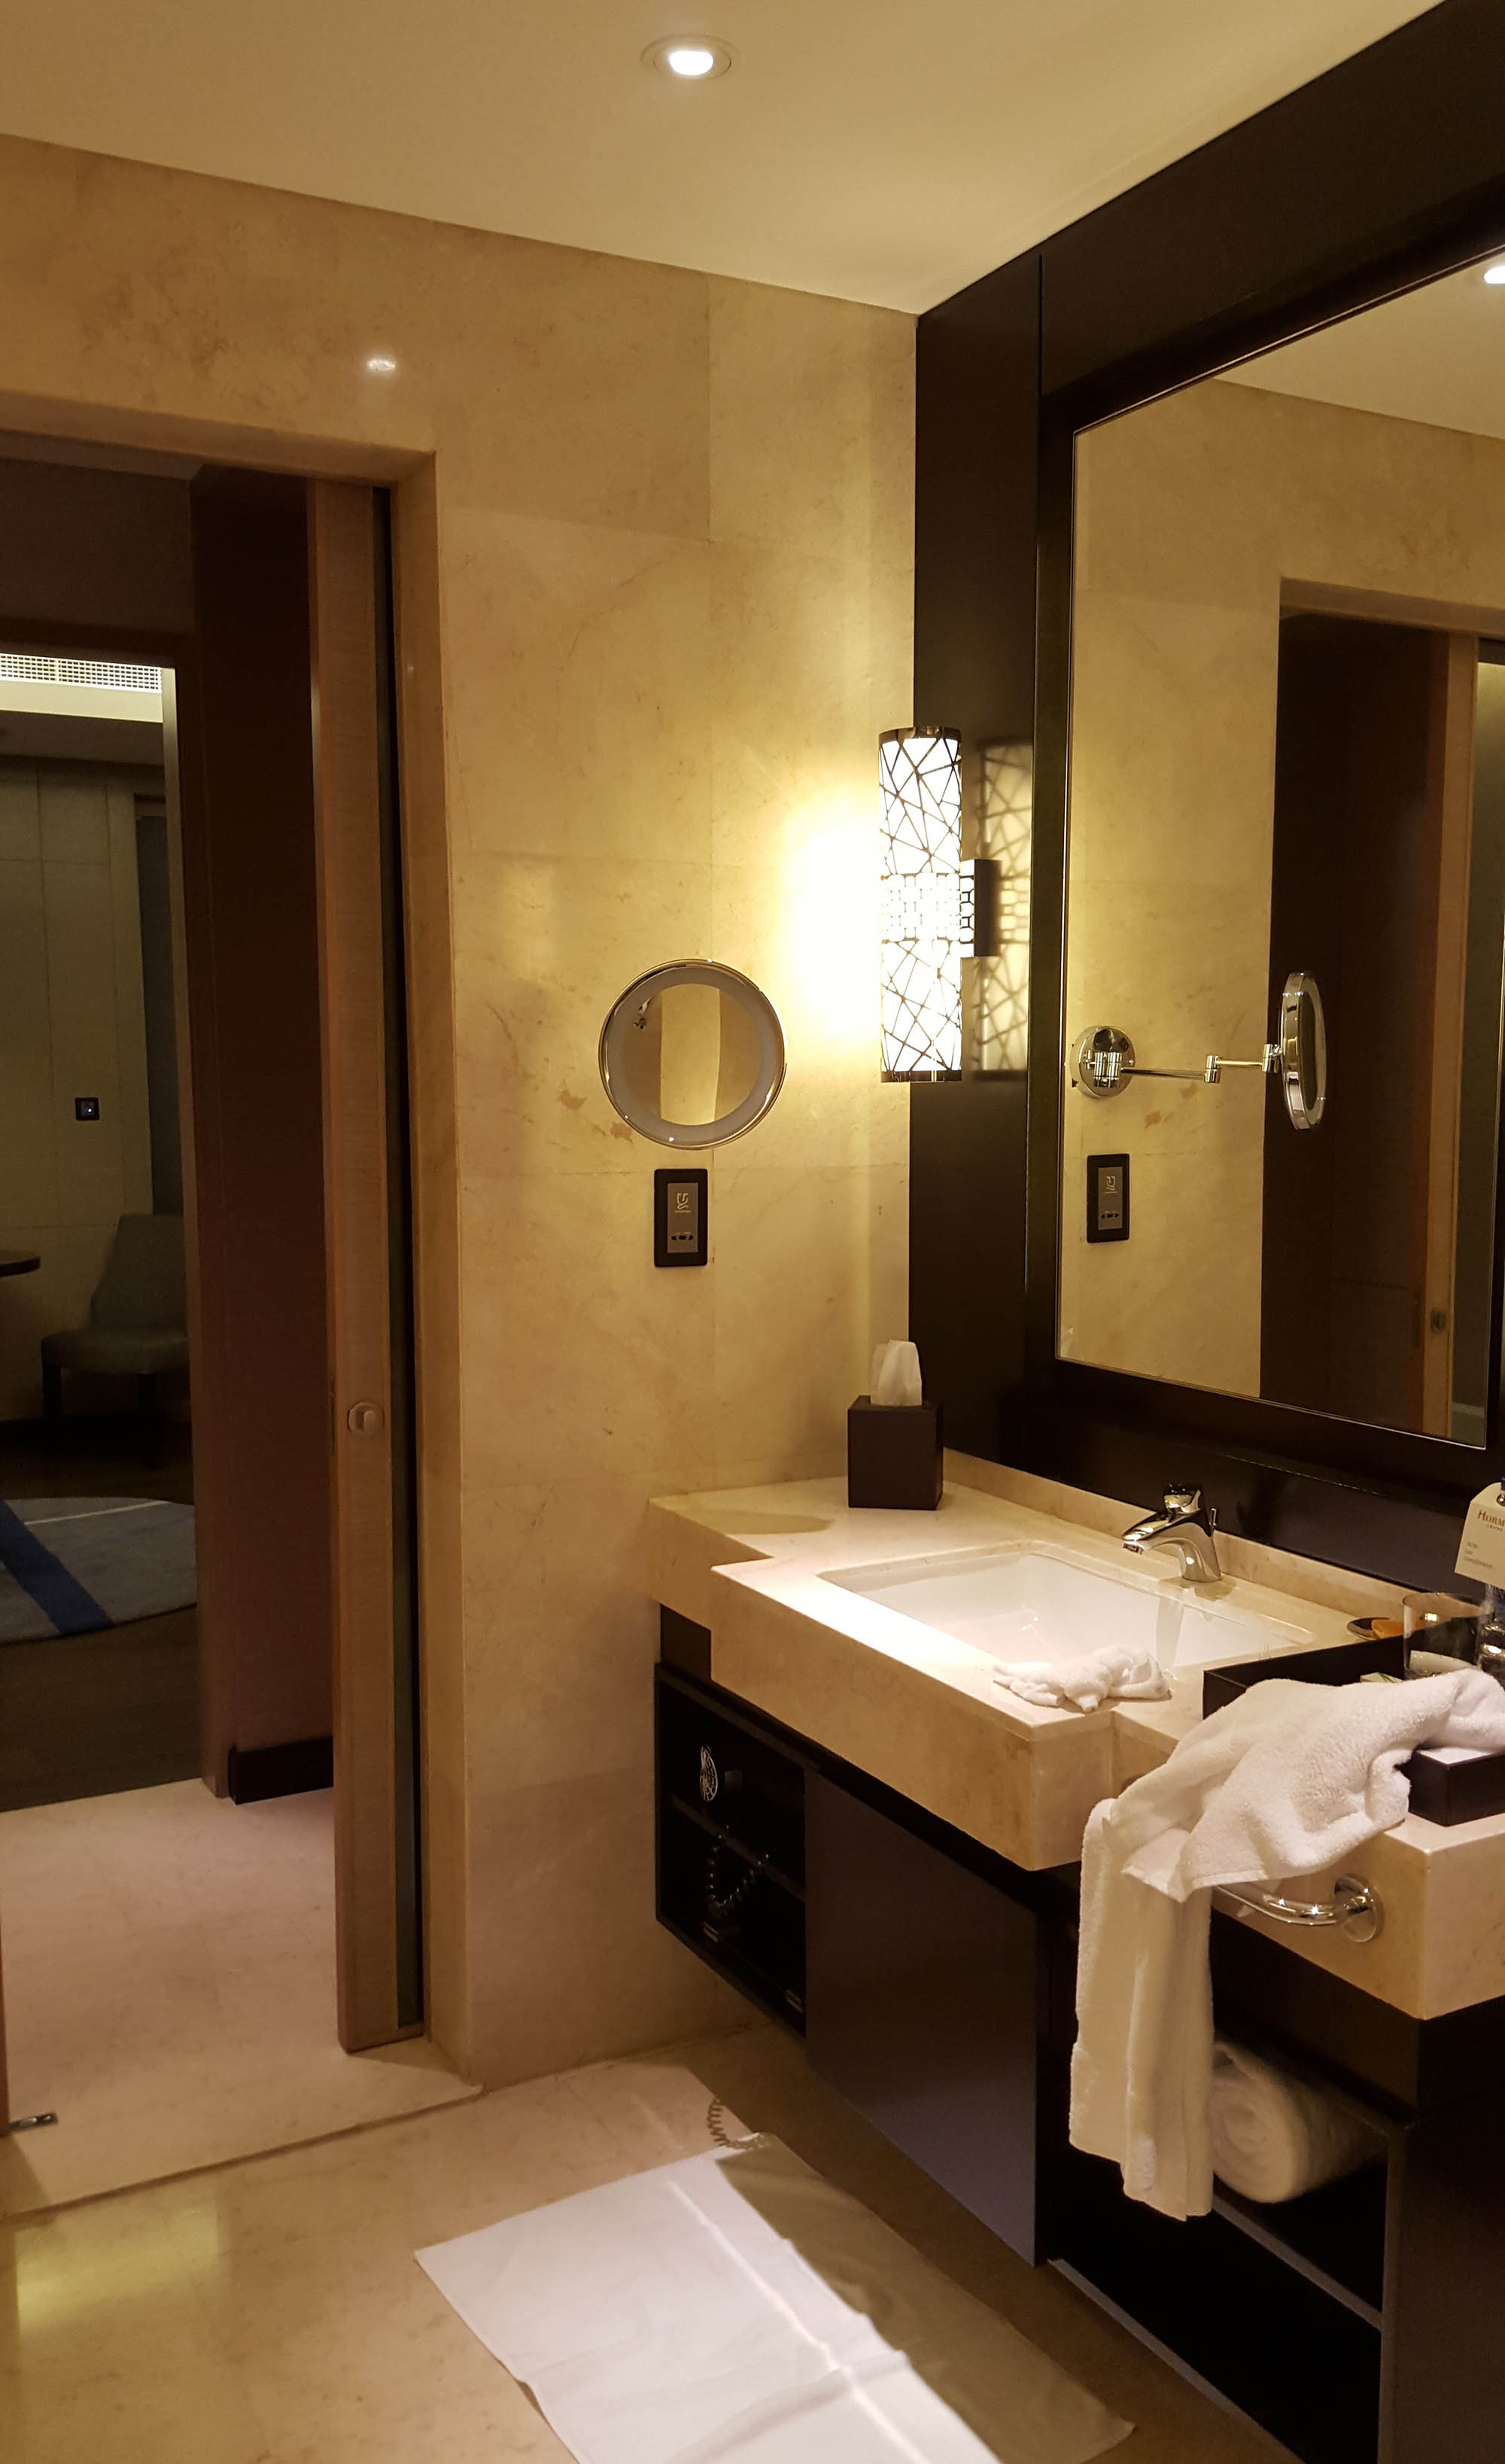 Hormuz Grand bathroom.jpg